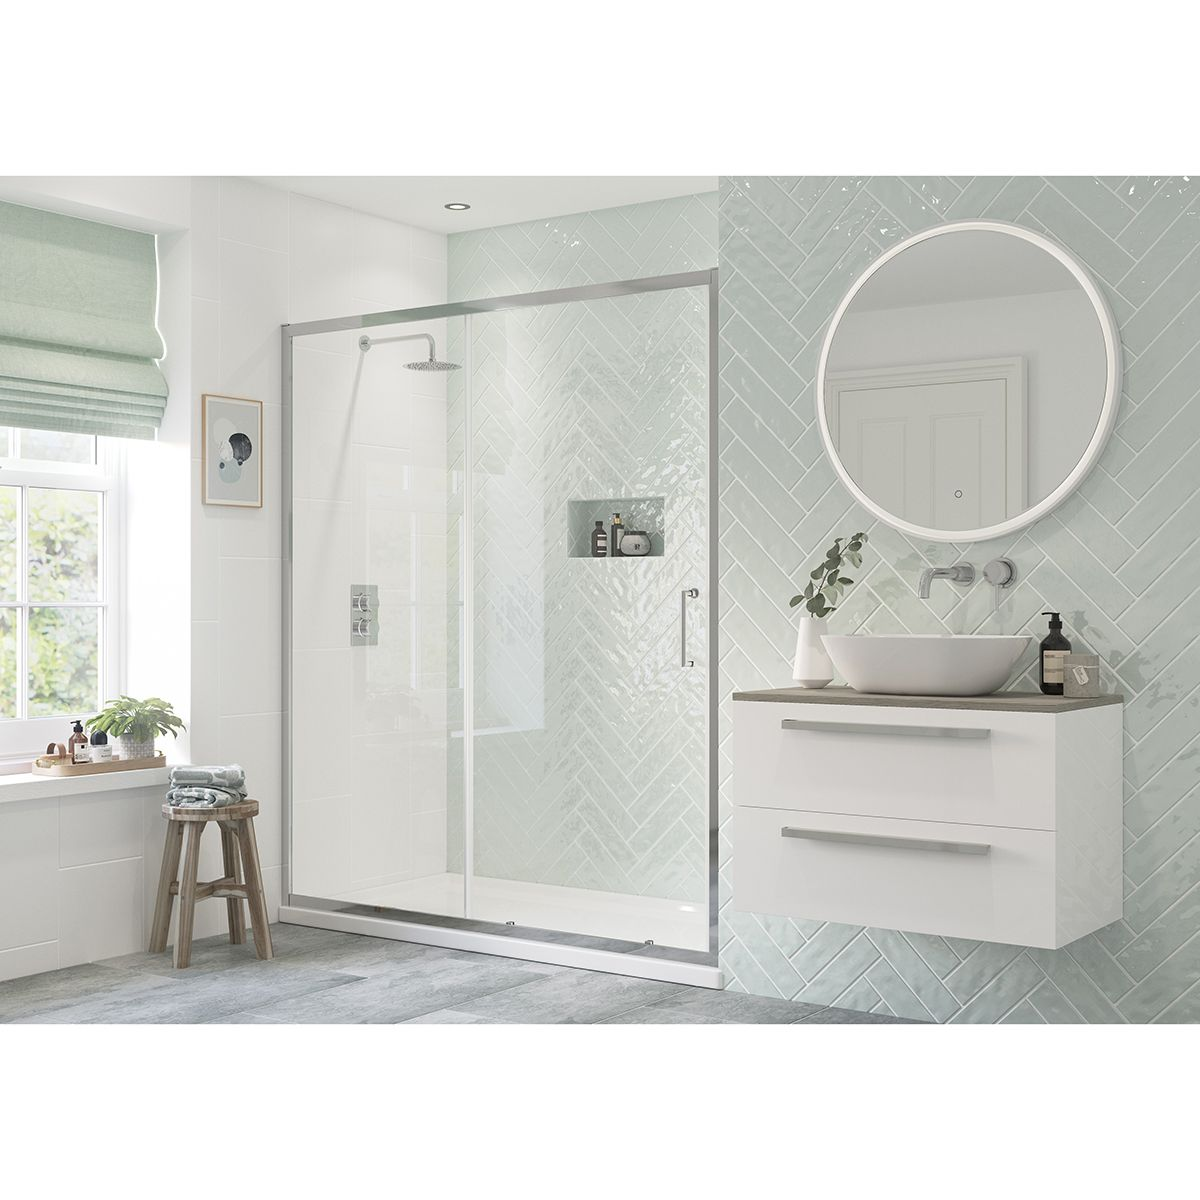 Bathrooms To Love RefleXion Flex Sliding Shower Door with Optional Side Panel